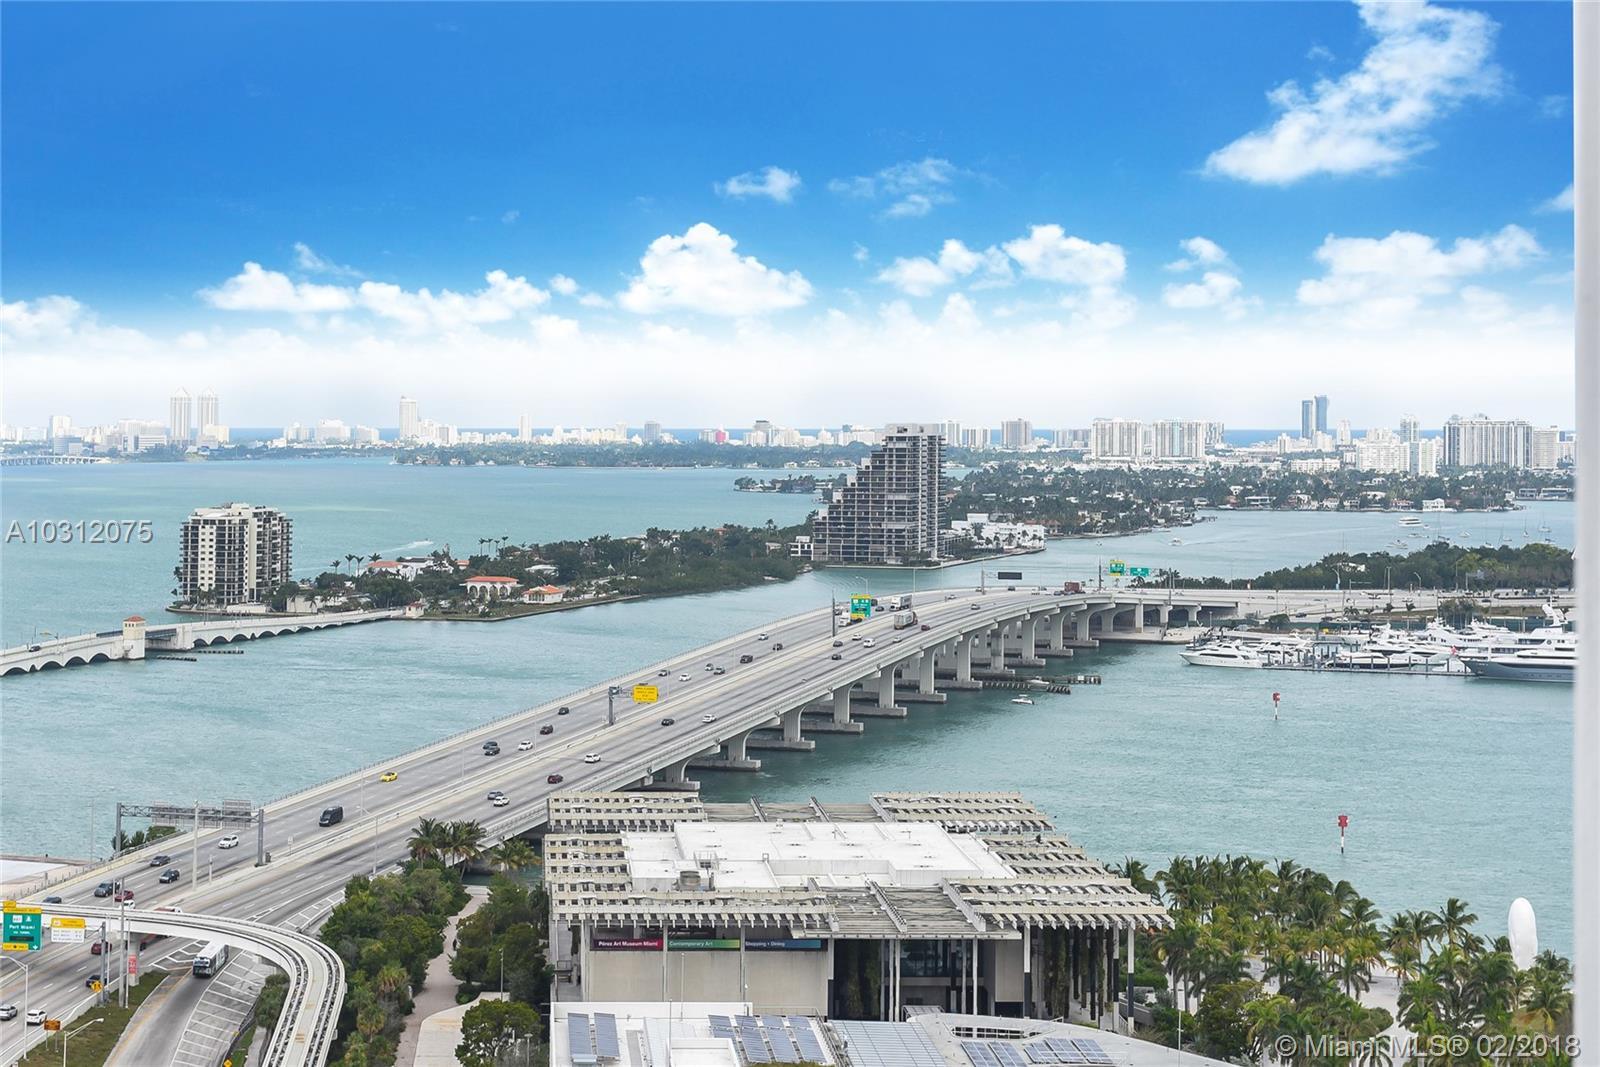 1040 BISCAYNE BL, 2405 - Miami, Florida